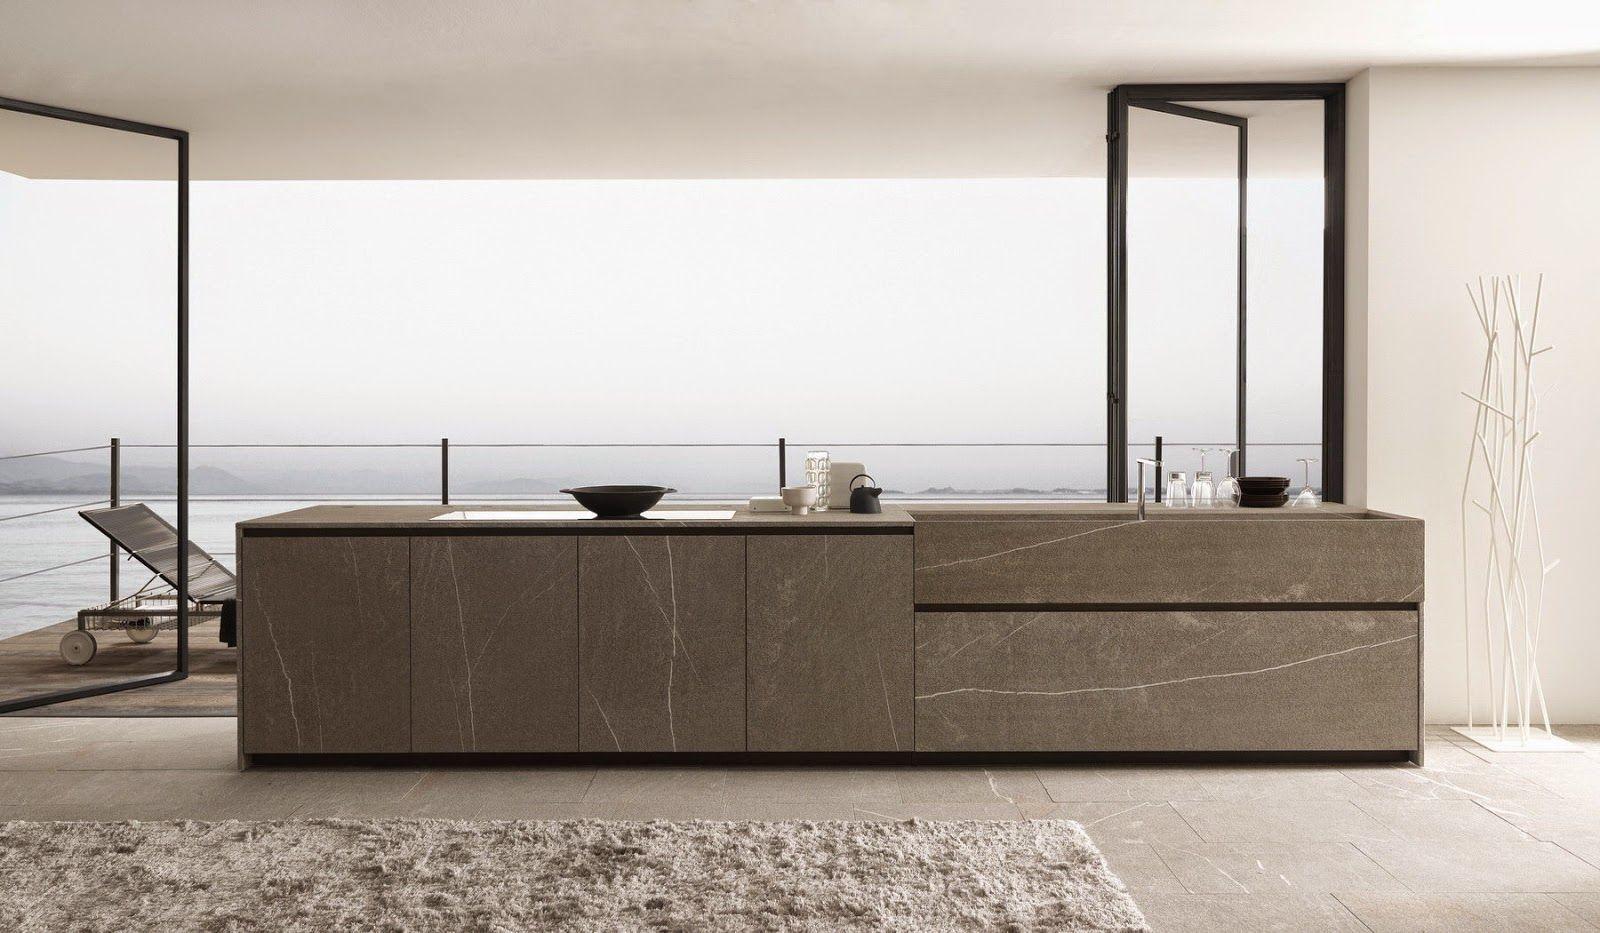 Minimalista gama elite estilo minimalista dise o for Idee casa minimalista